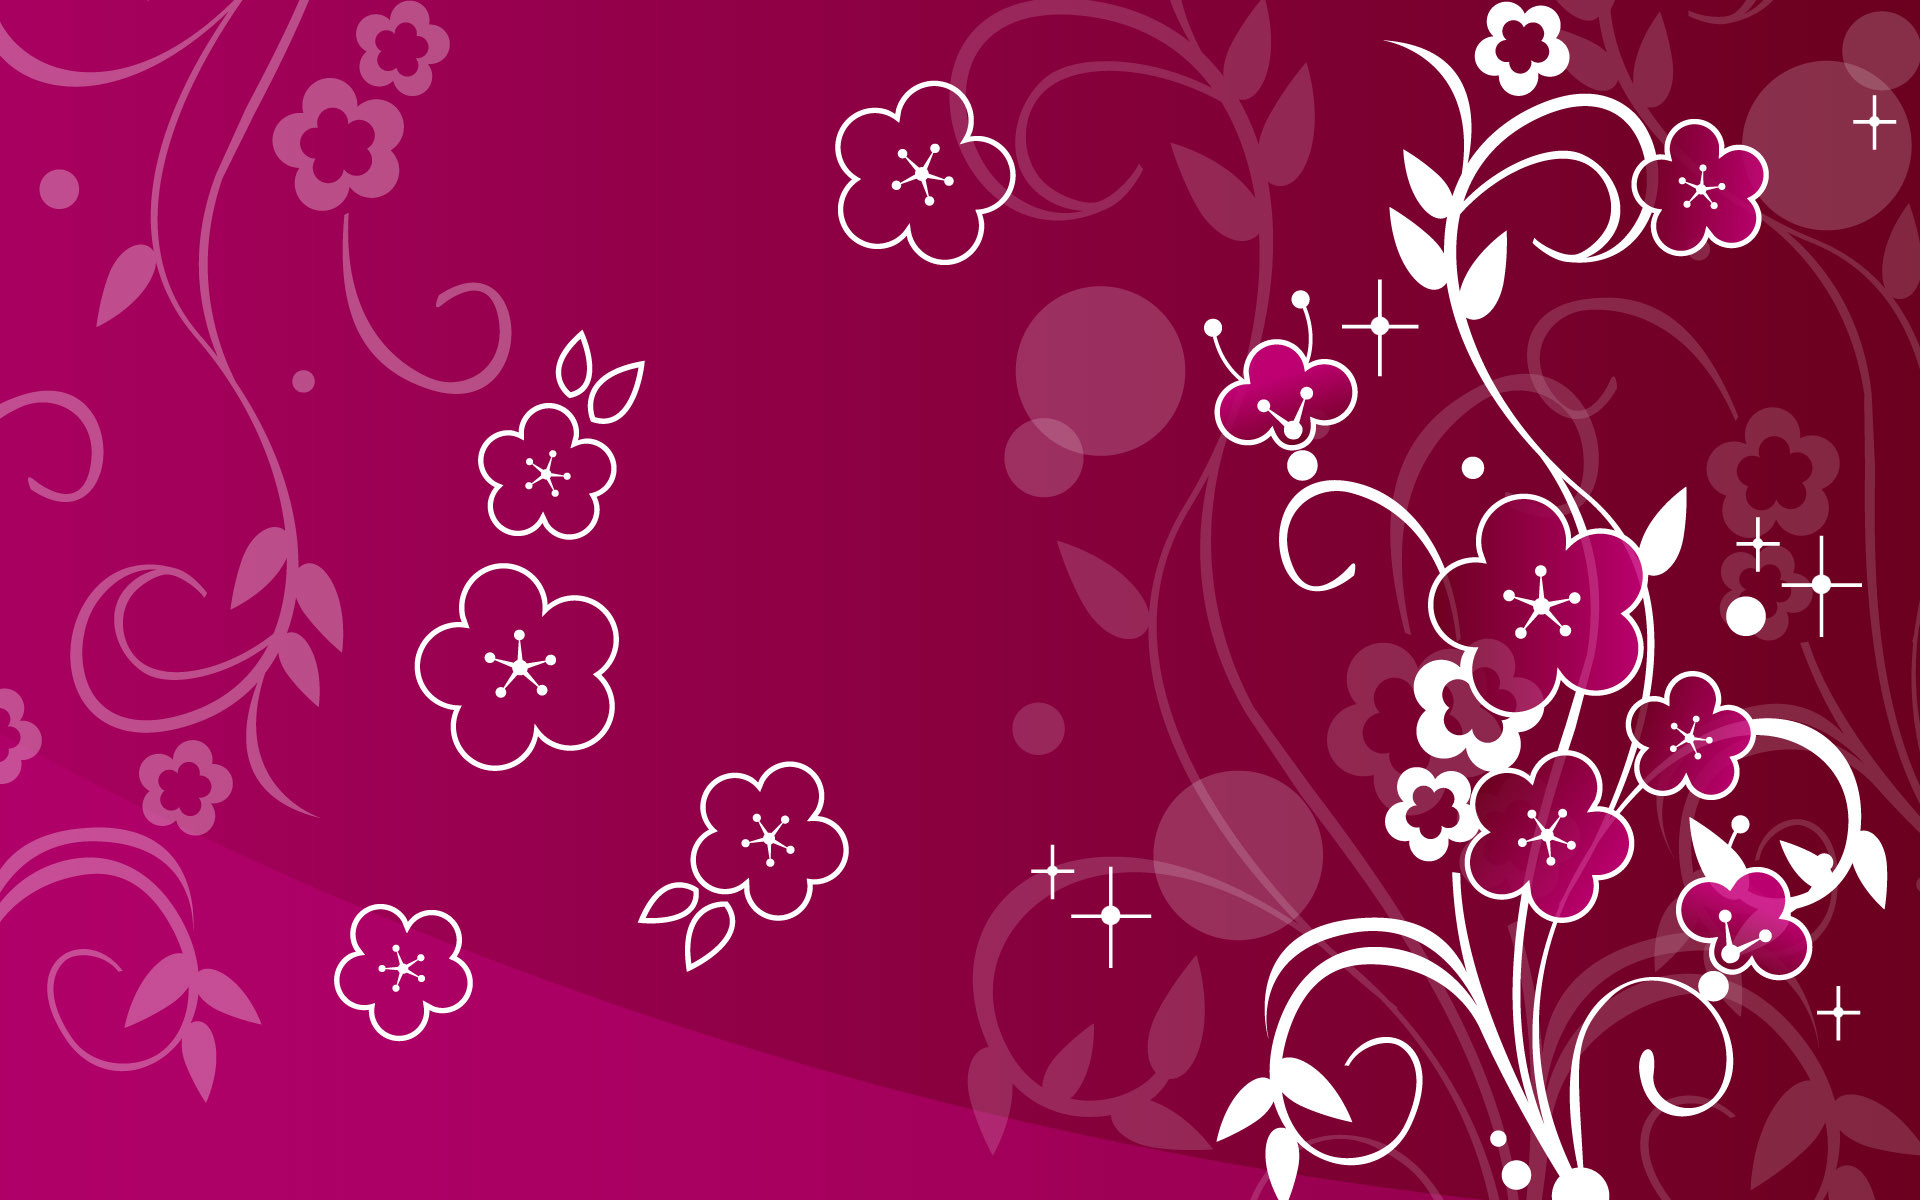 Sparkle Pink Wallpaper 56 Images